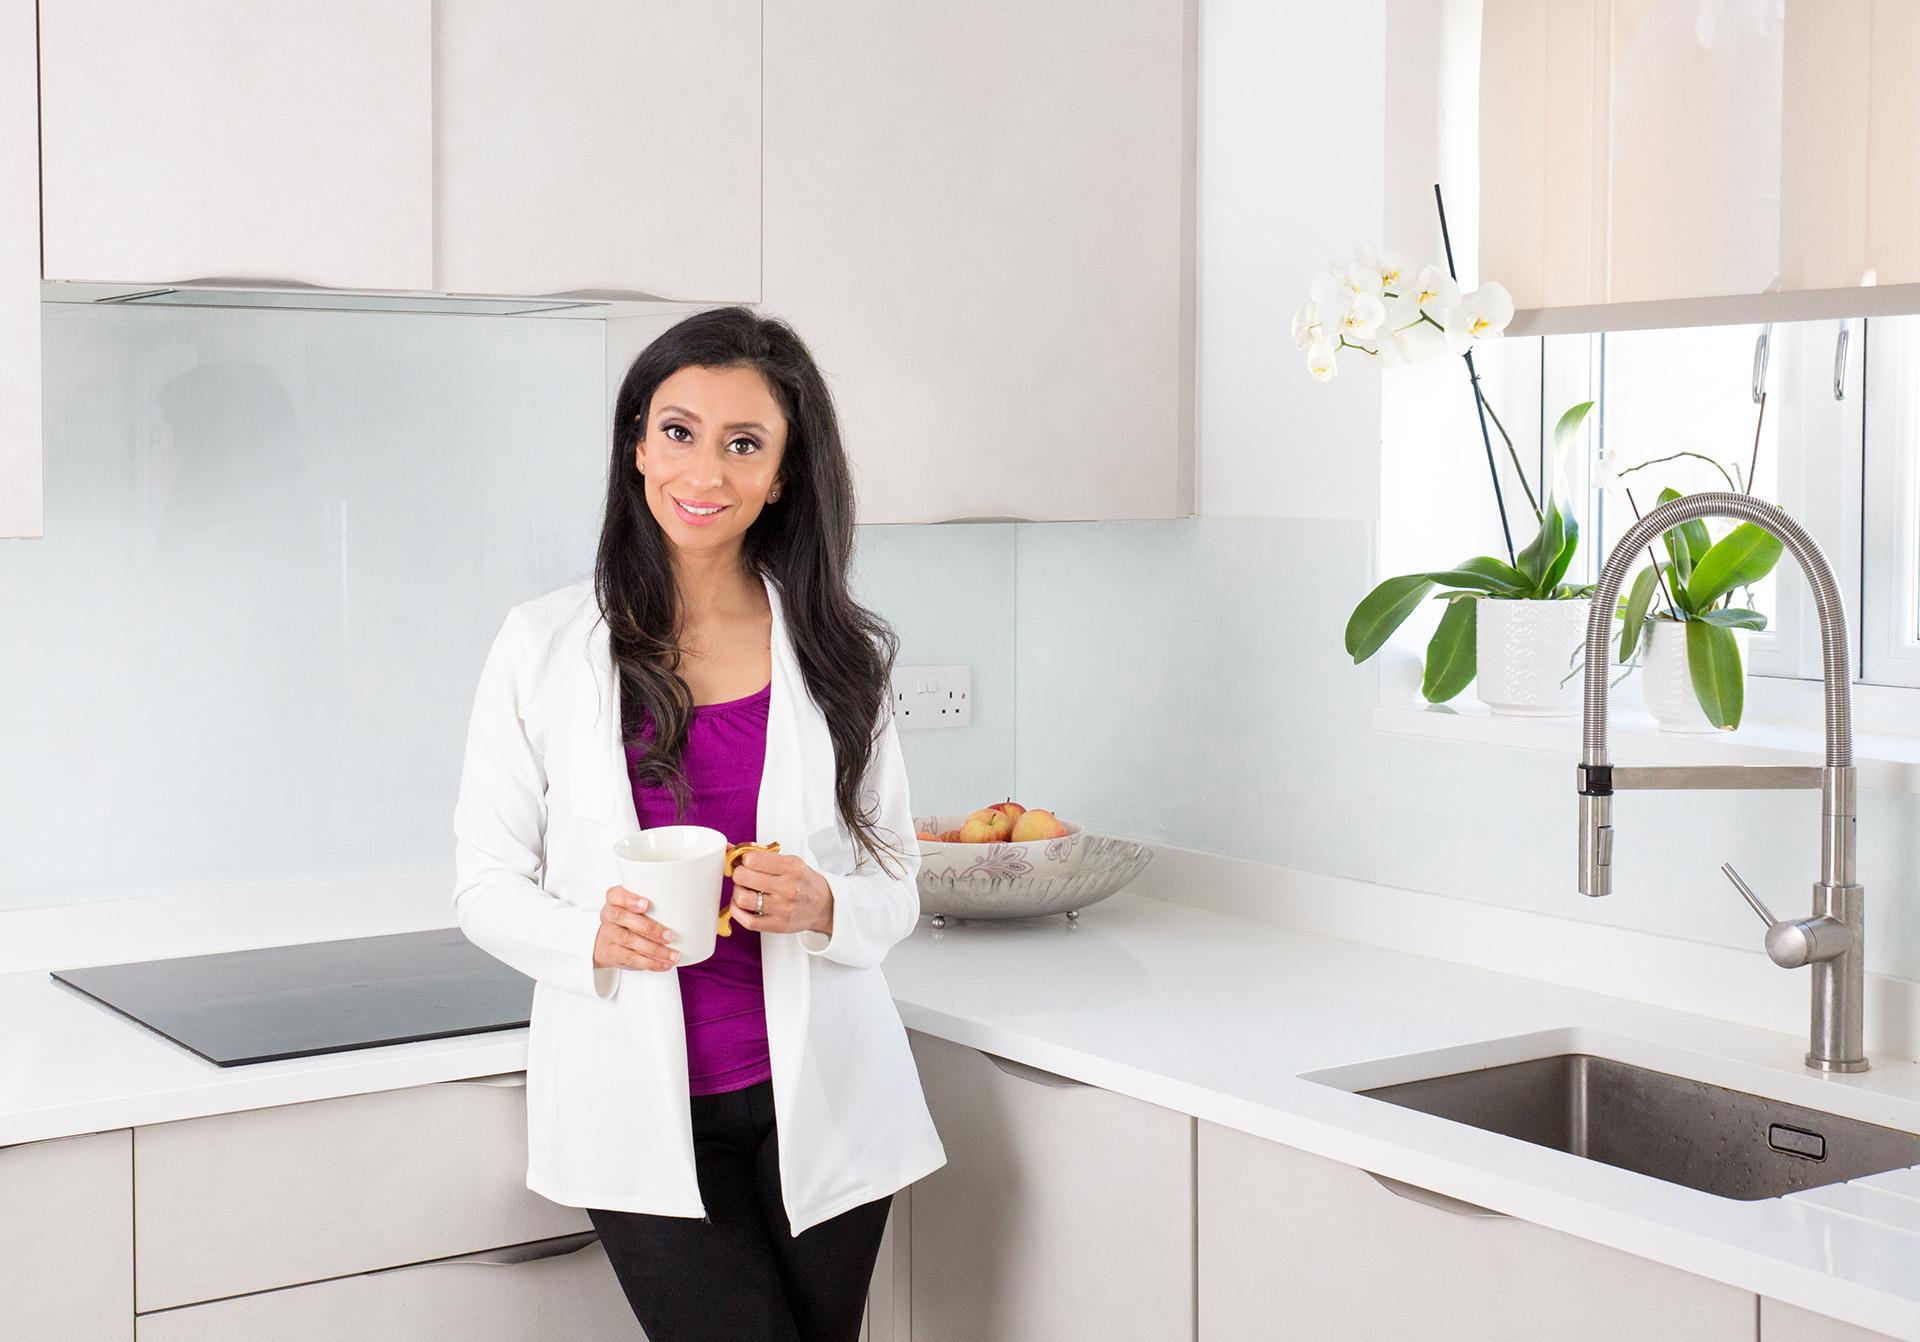 Osteopath, Nadia Alibhai